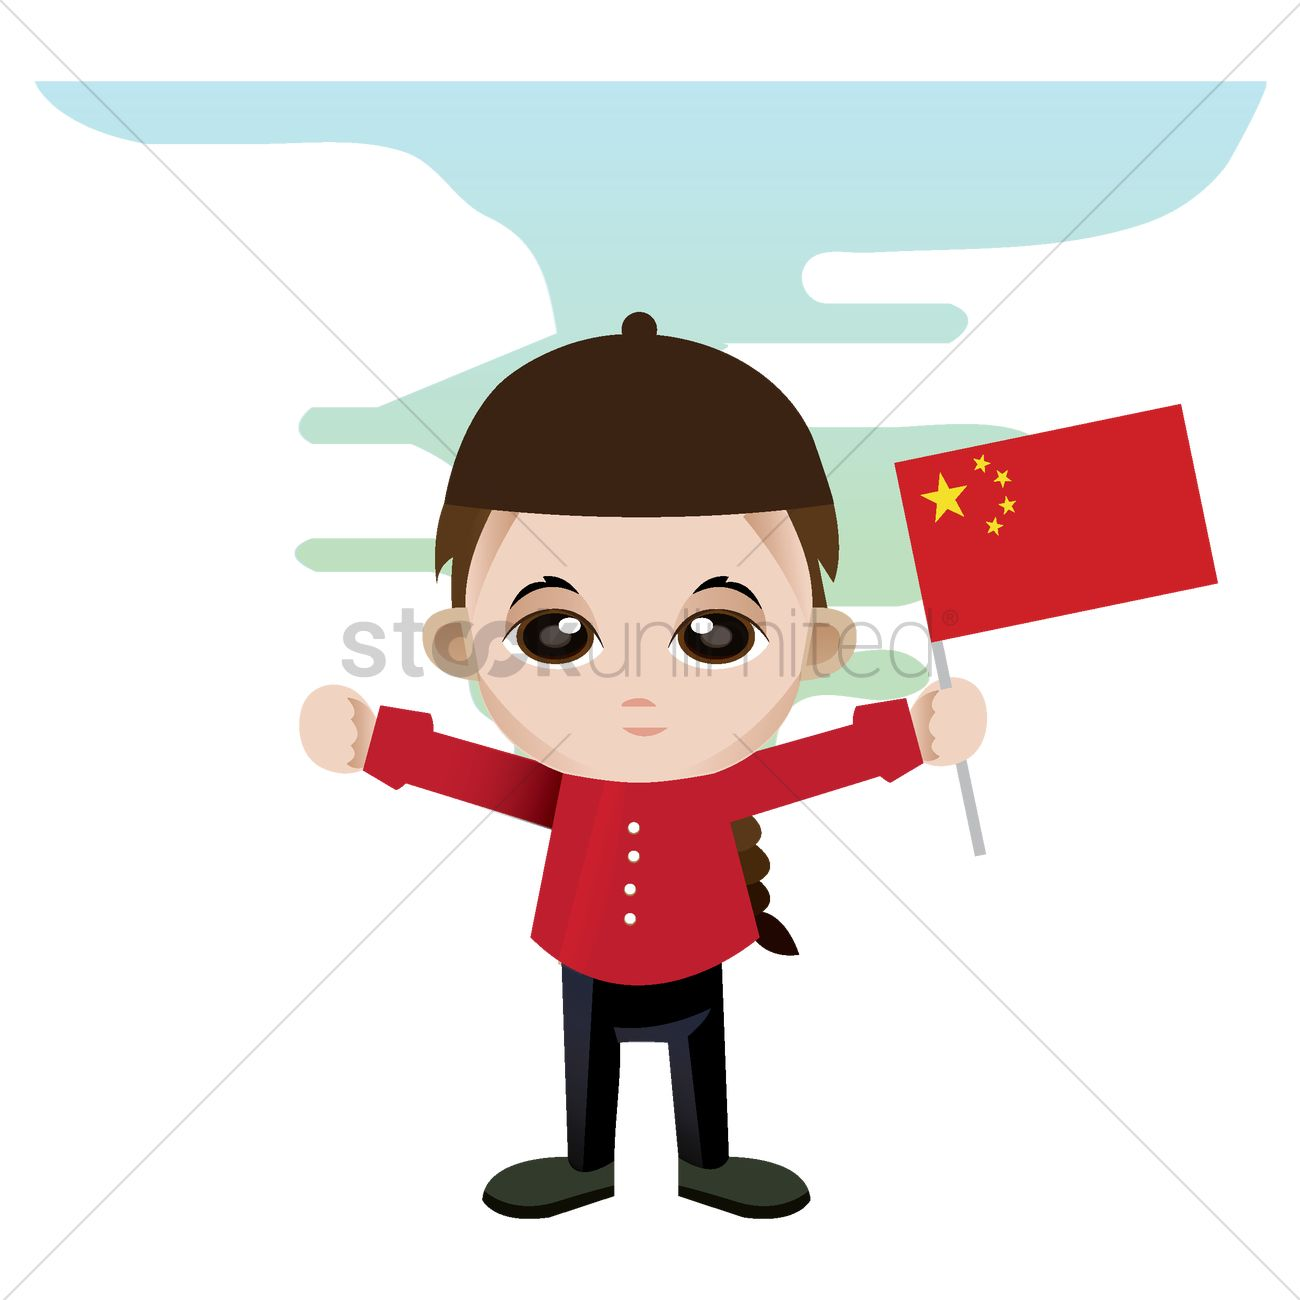 Boy Holding China Flag Vector Image 1356083 Stockunlimited